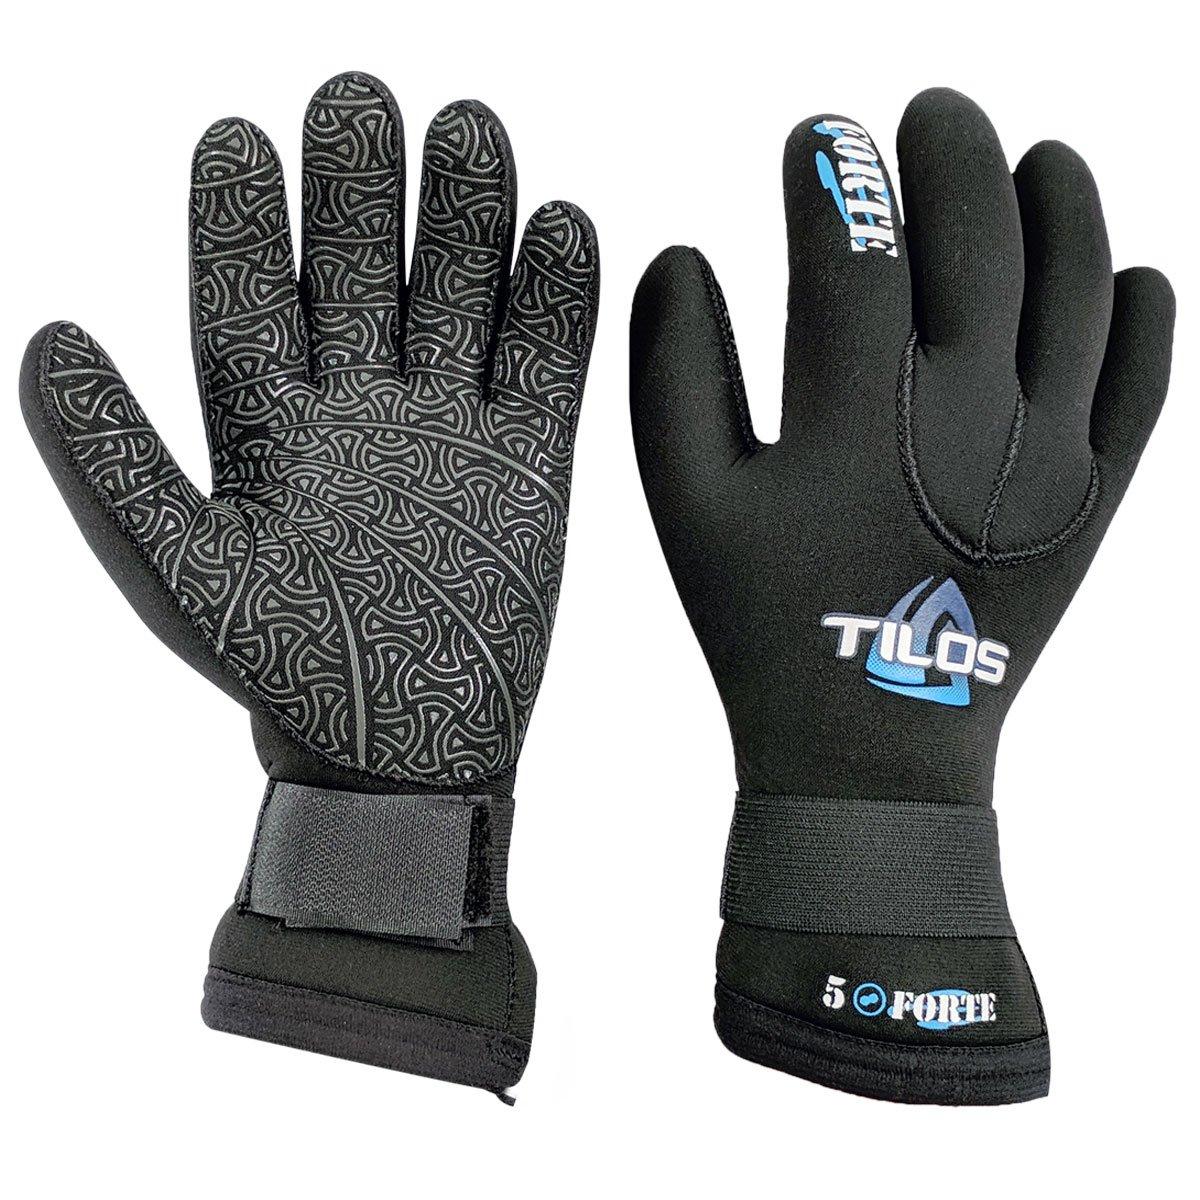 Tilos 5mm Titanium Velcro Glove